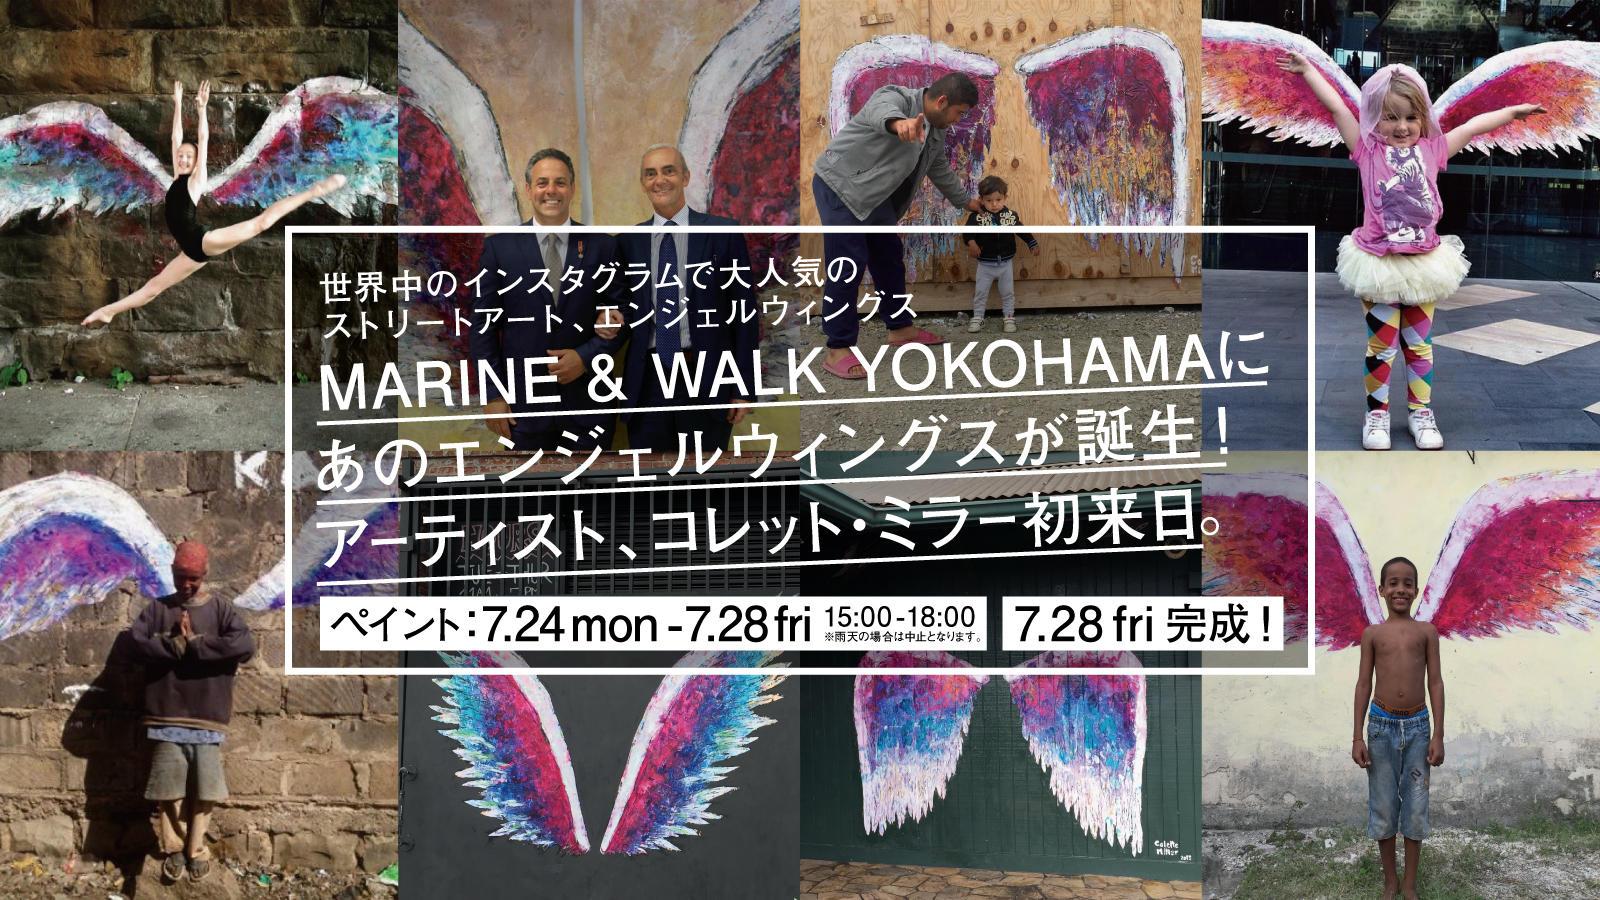 ANGEL WINGS がMARINE&WALK に誕生!!